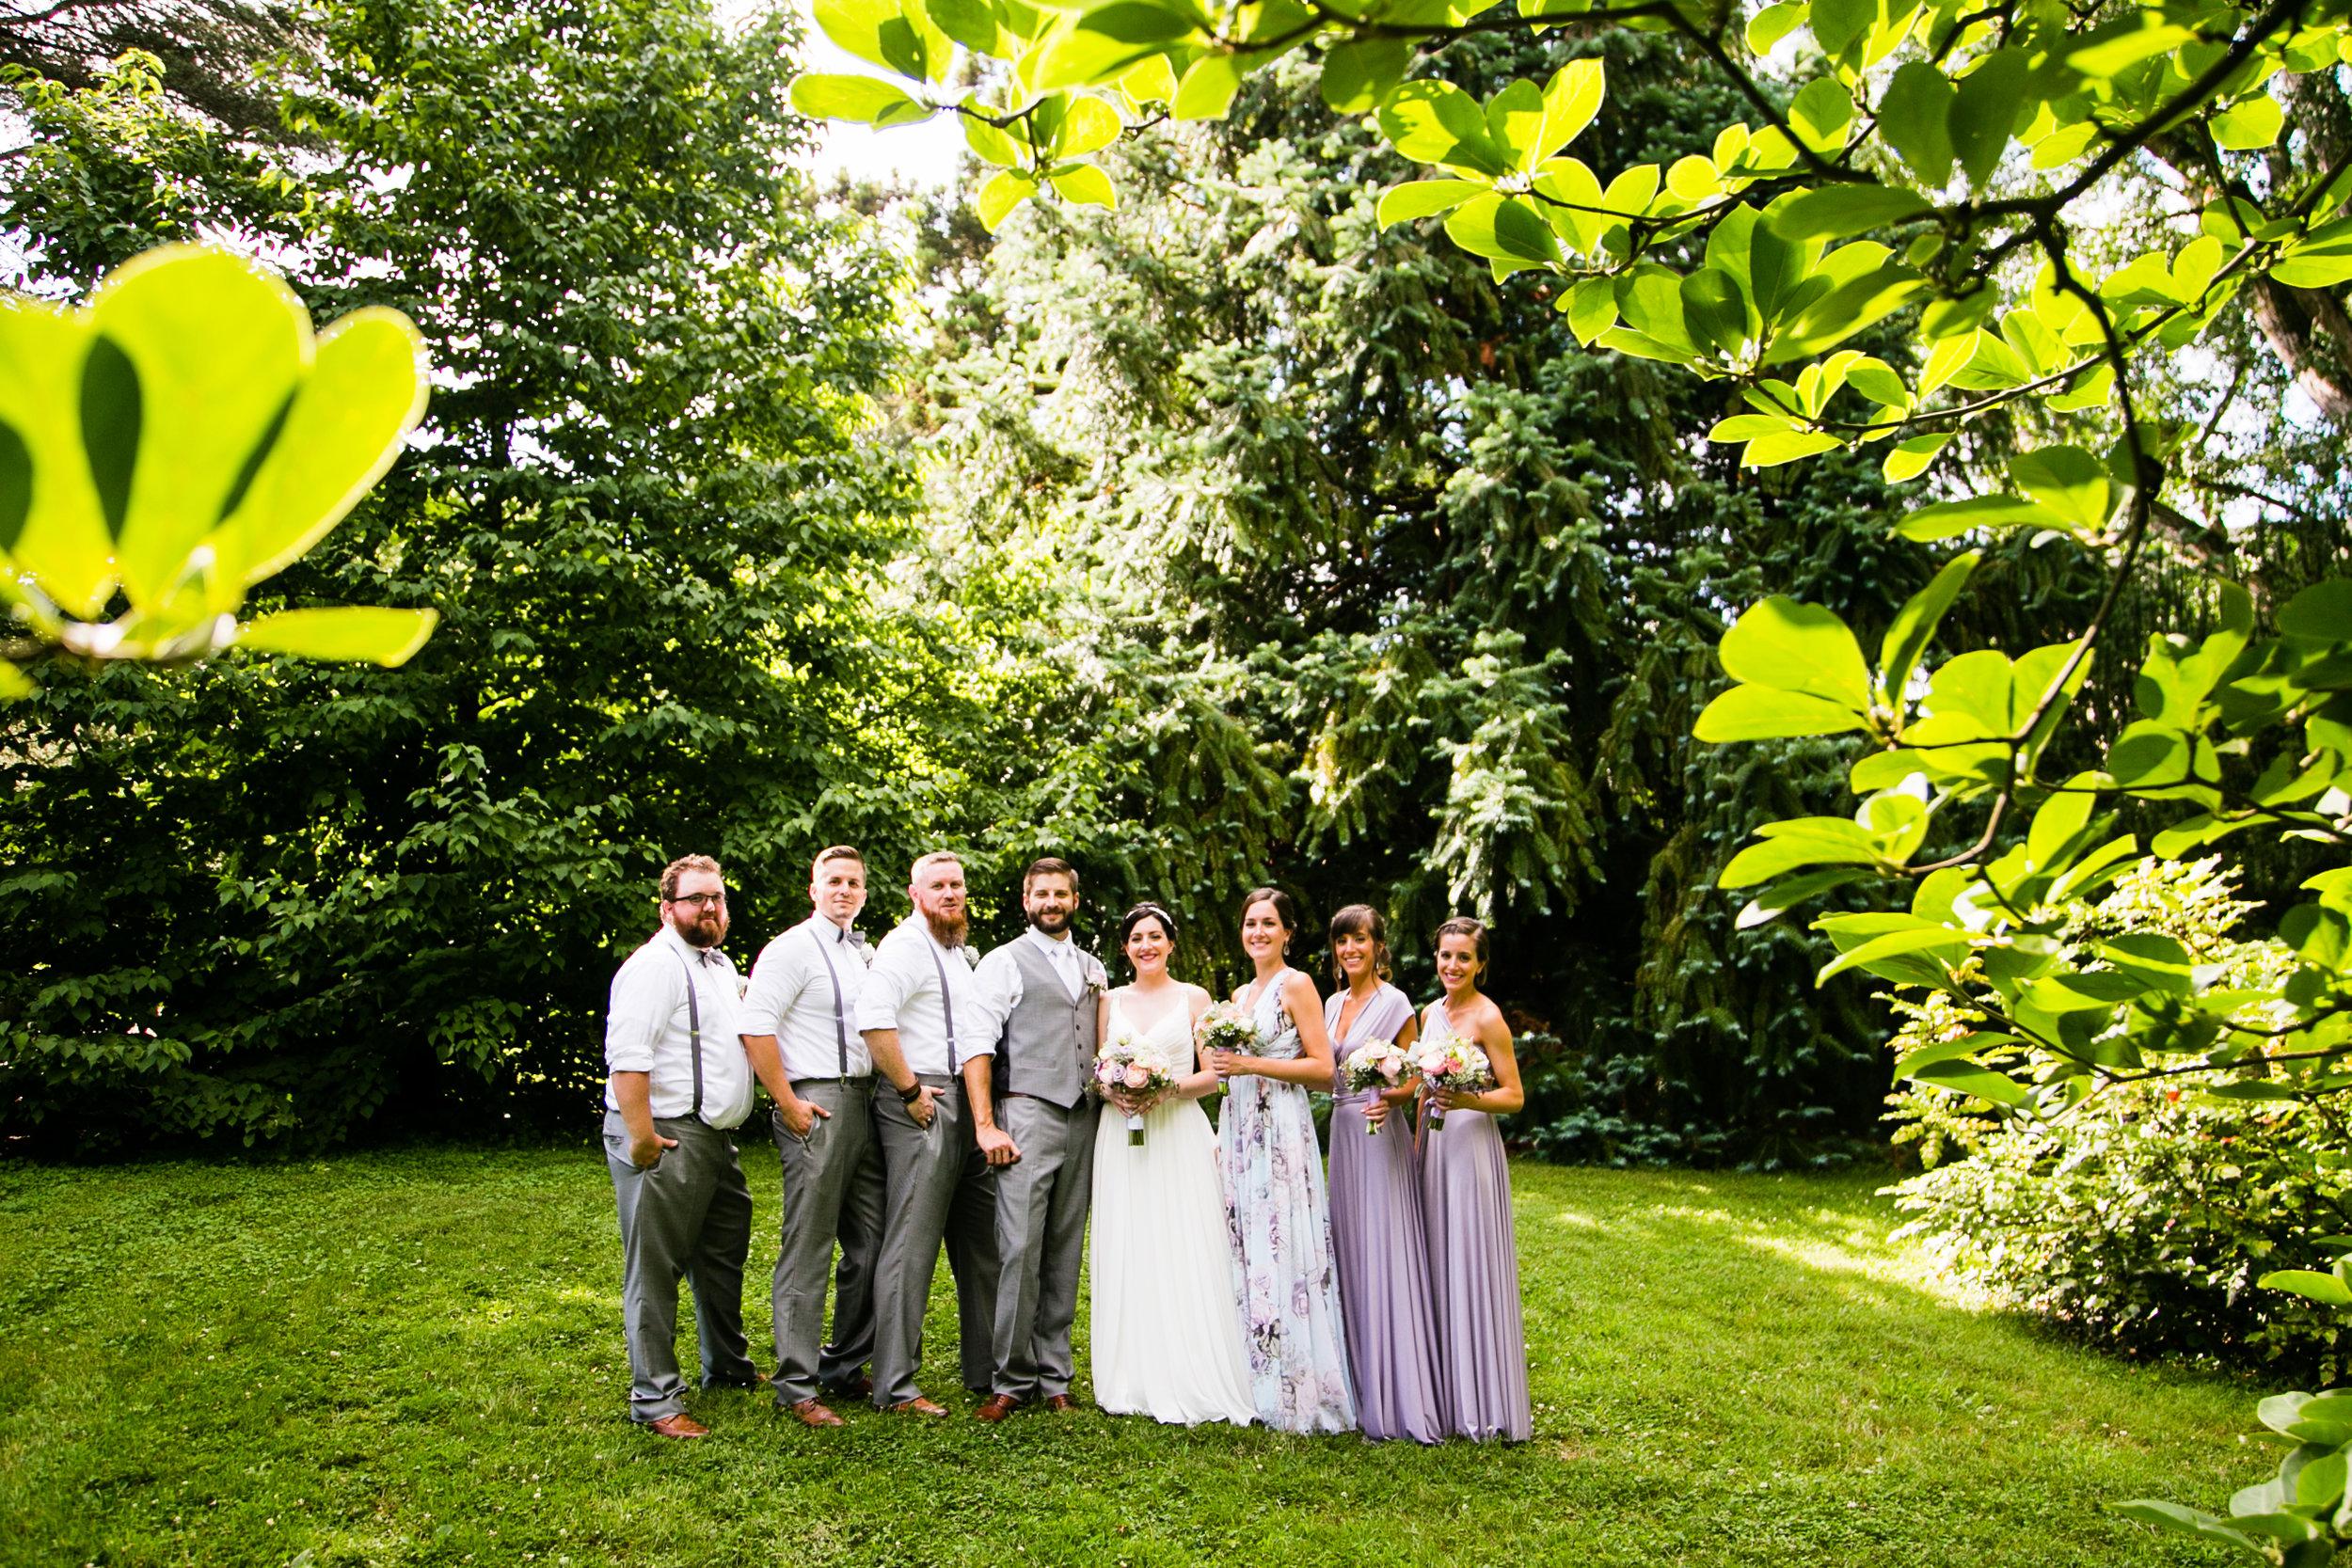 TYLER ARBORETUM WEDDING PHOTOGRAPHY LOVESTRUCK PICTURES-029.jpg